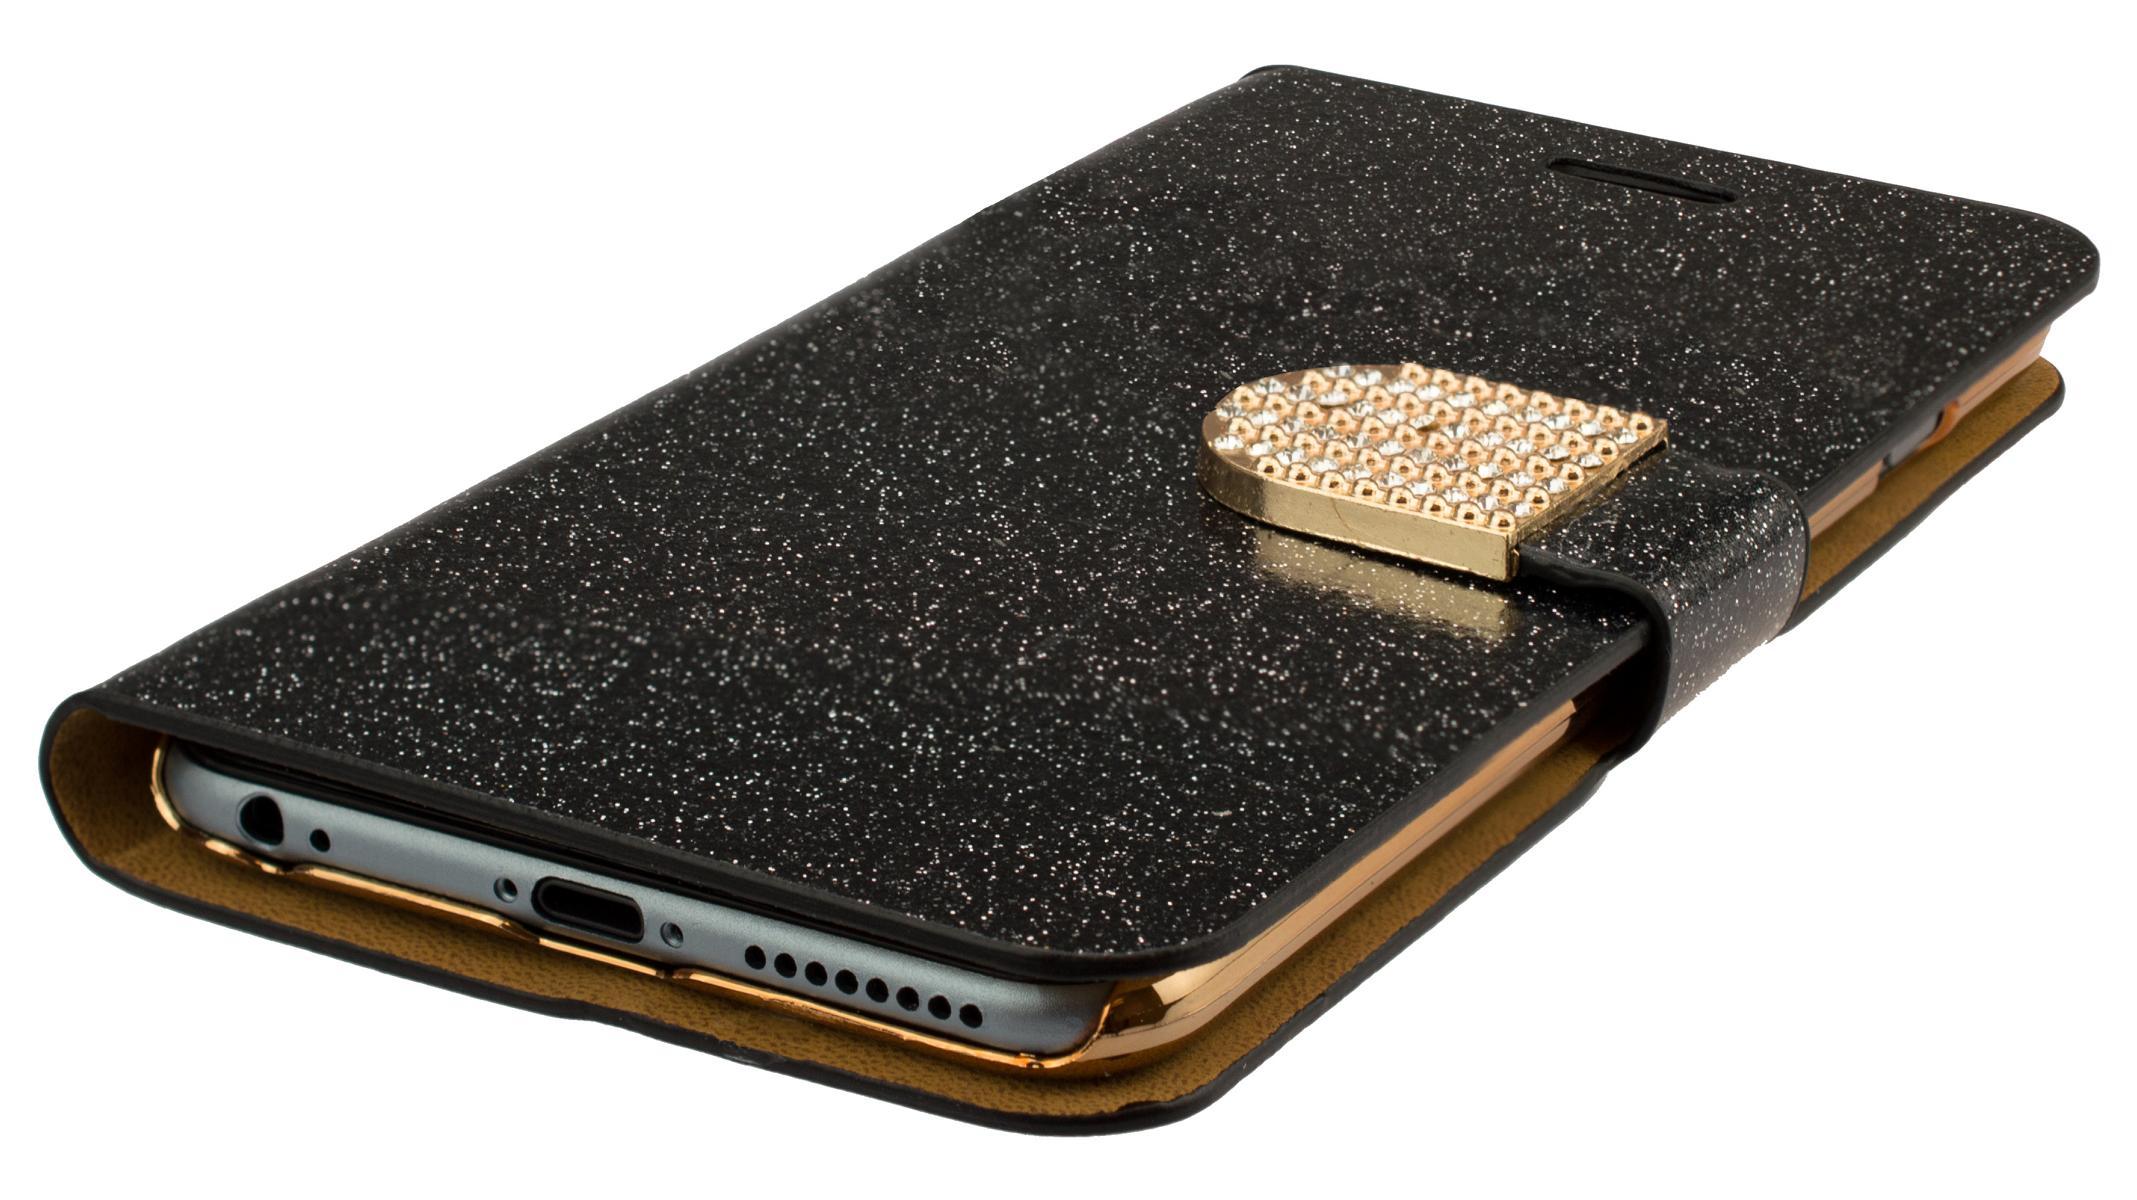 iphone 6plus glitzer smartphone h lle tasche handy. Black Bedroom Furniture Sets. Home Design Ideas